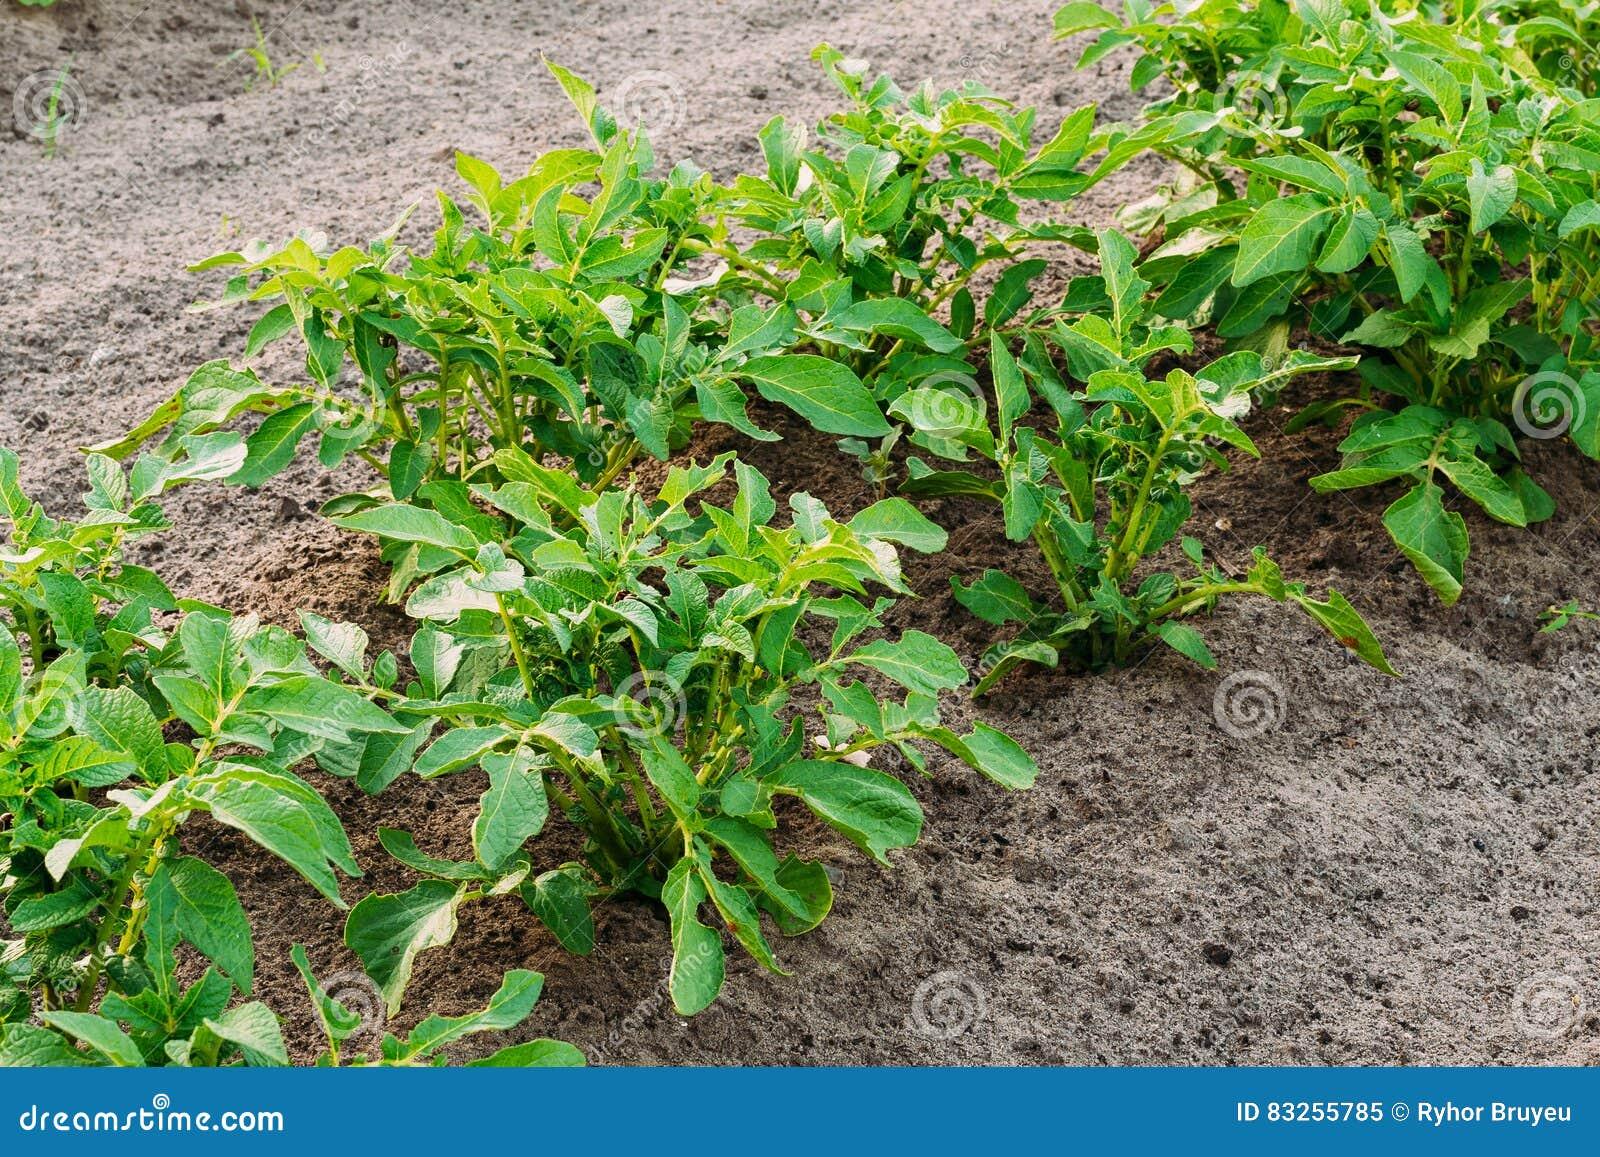 Fertilizer For Raised Vegetable Garden Beds